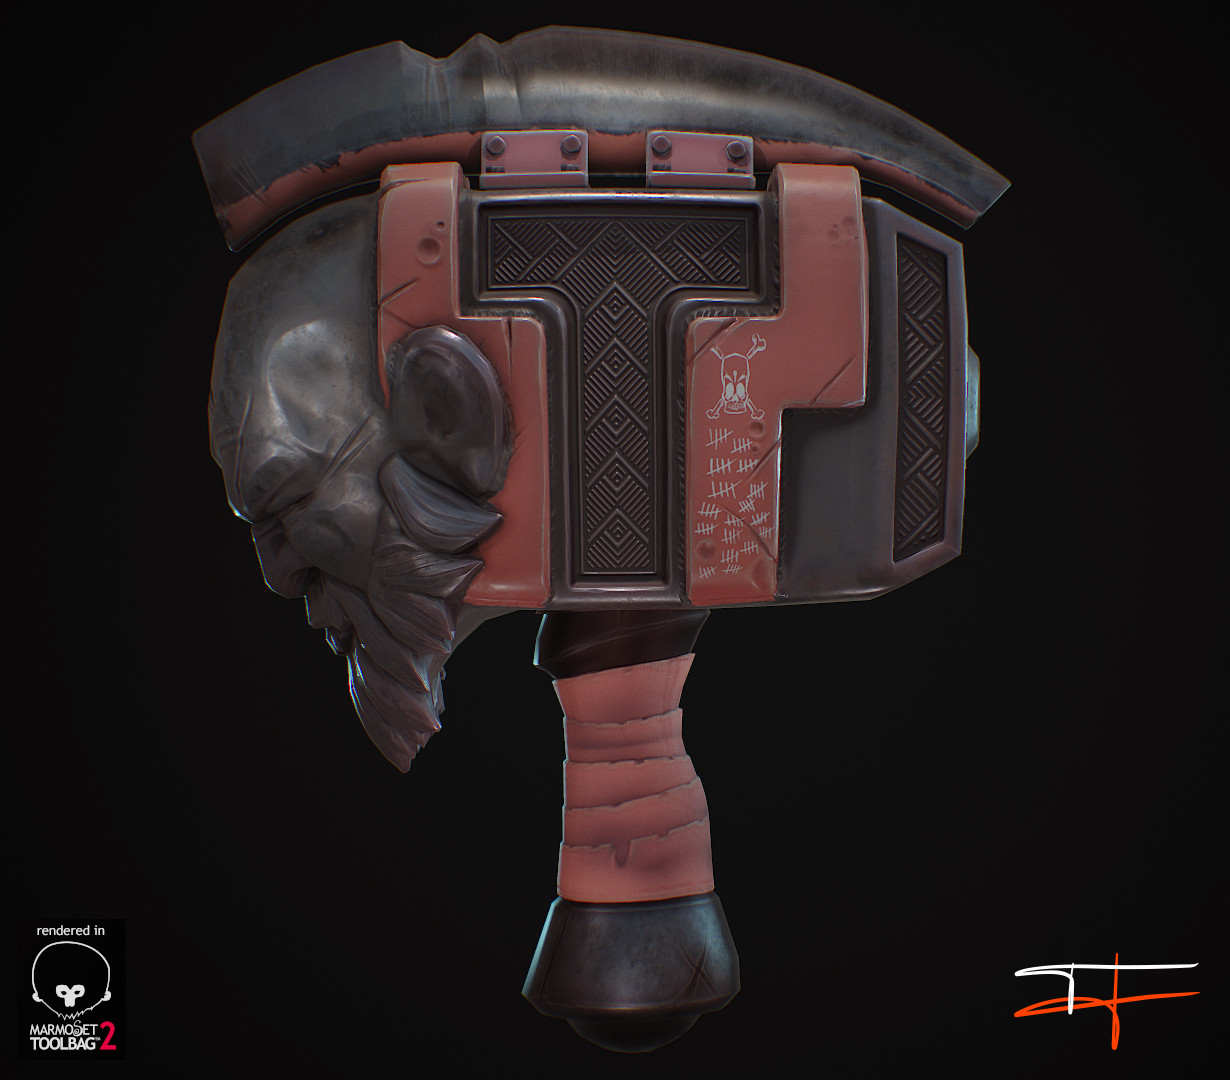 Tim jacksteit hammer shot003